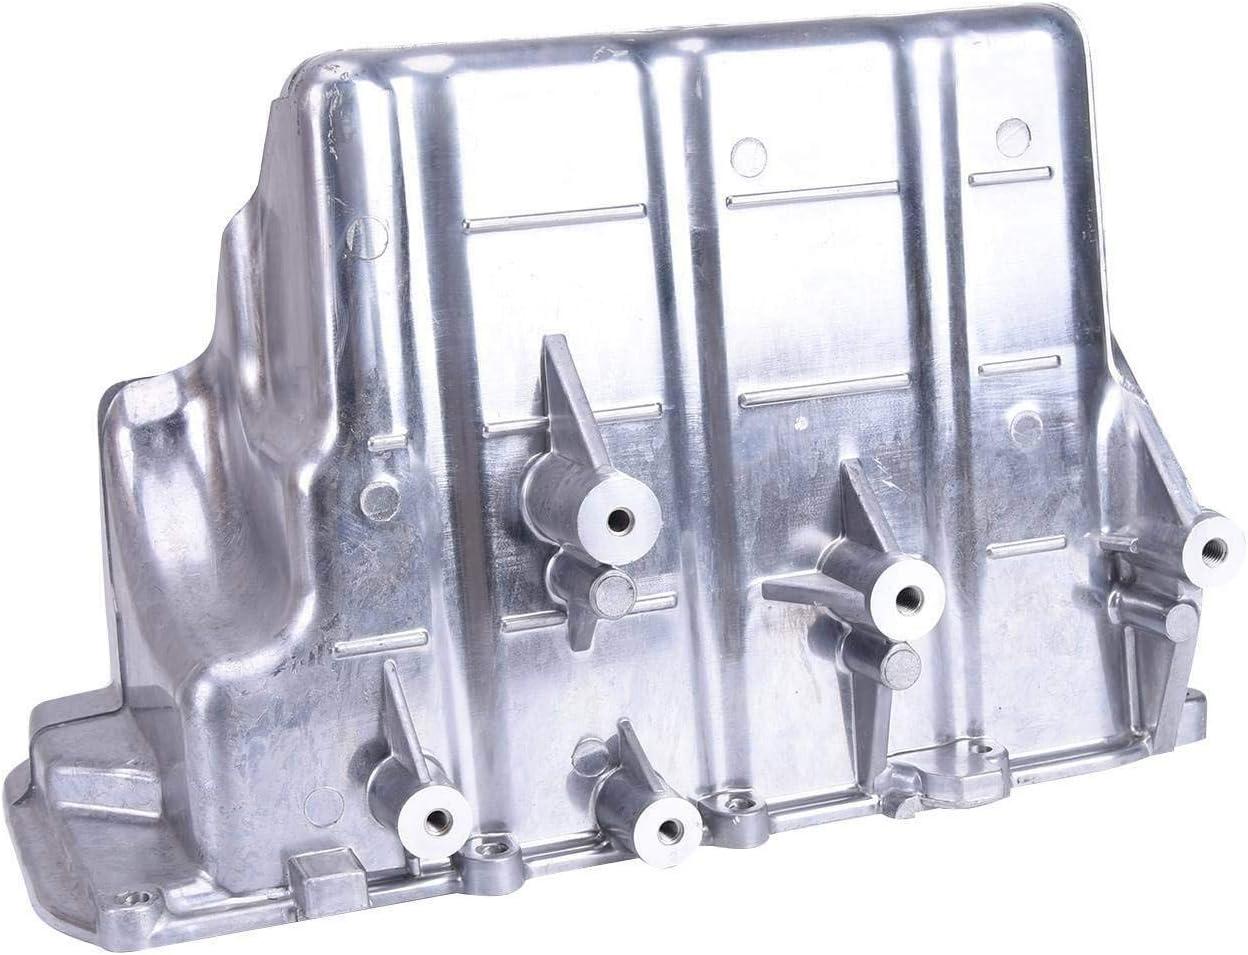 Winison Aluminum Engine Oil Pan for Smart Fortwo 2008-2015 1320100013